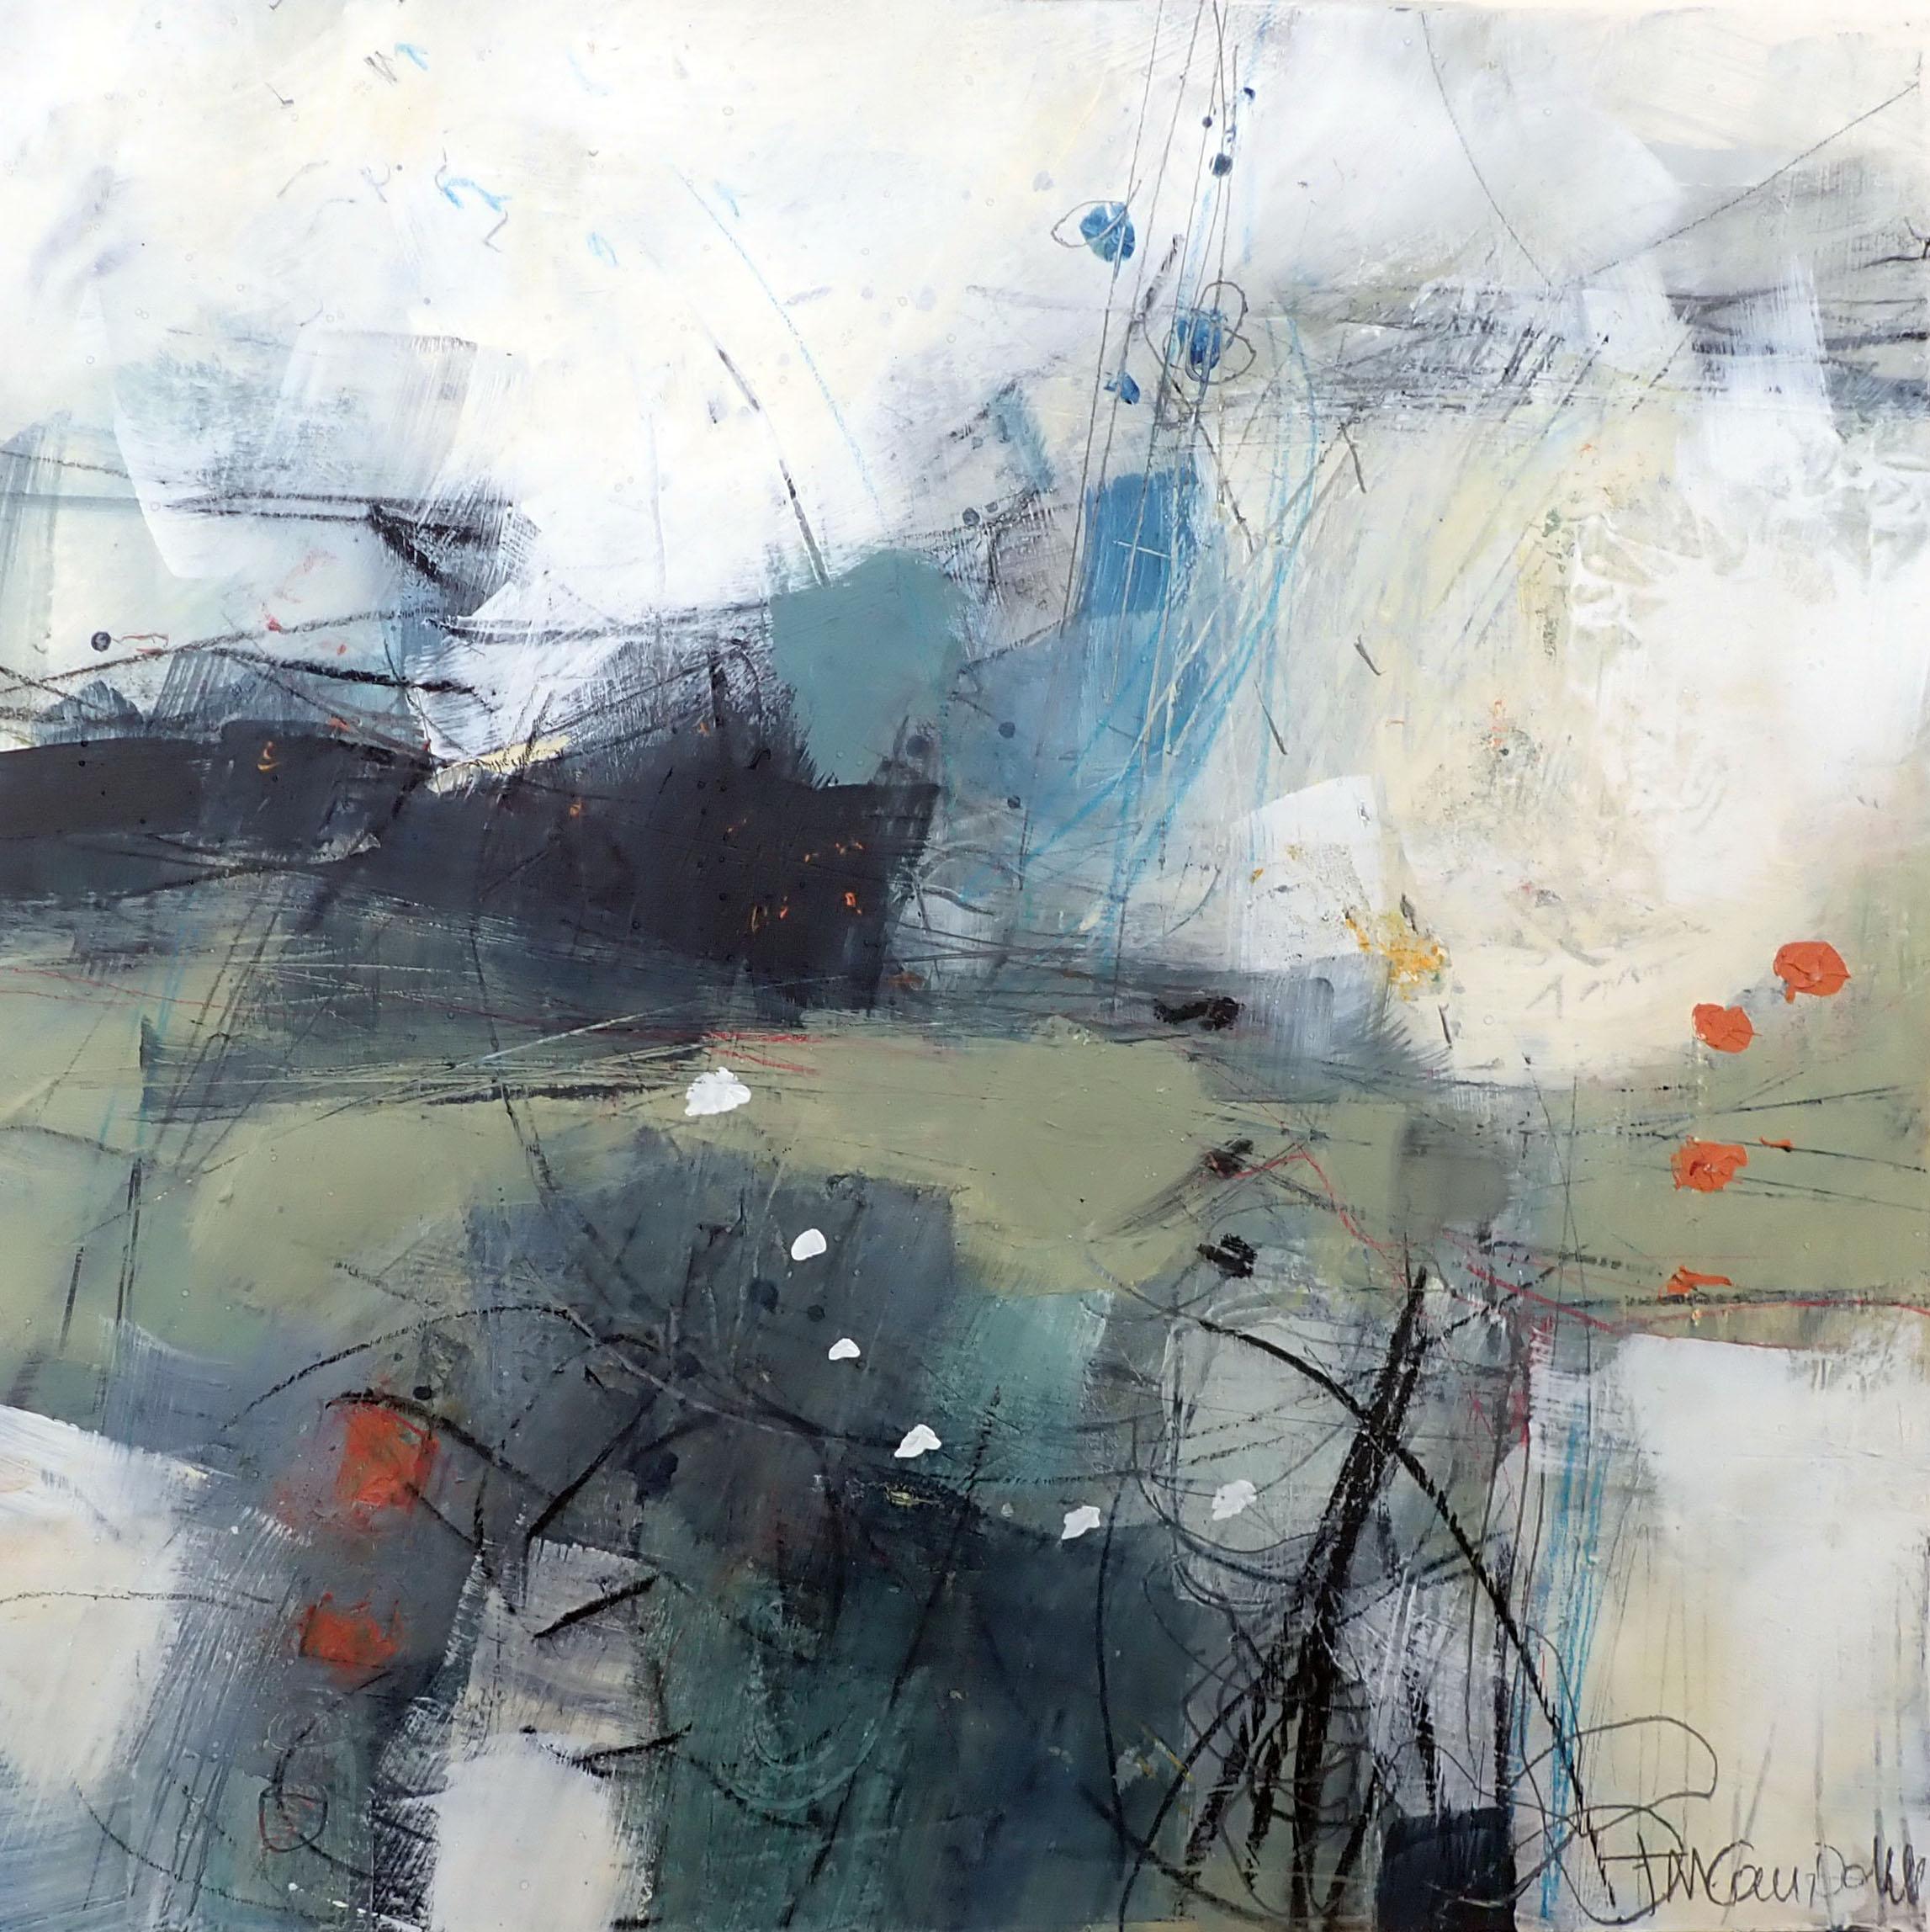 Sea Spray I (Frances Campbell)